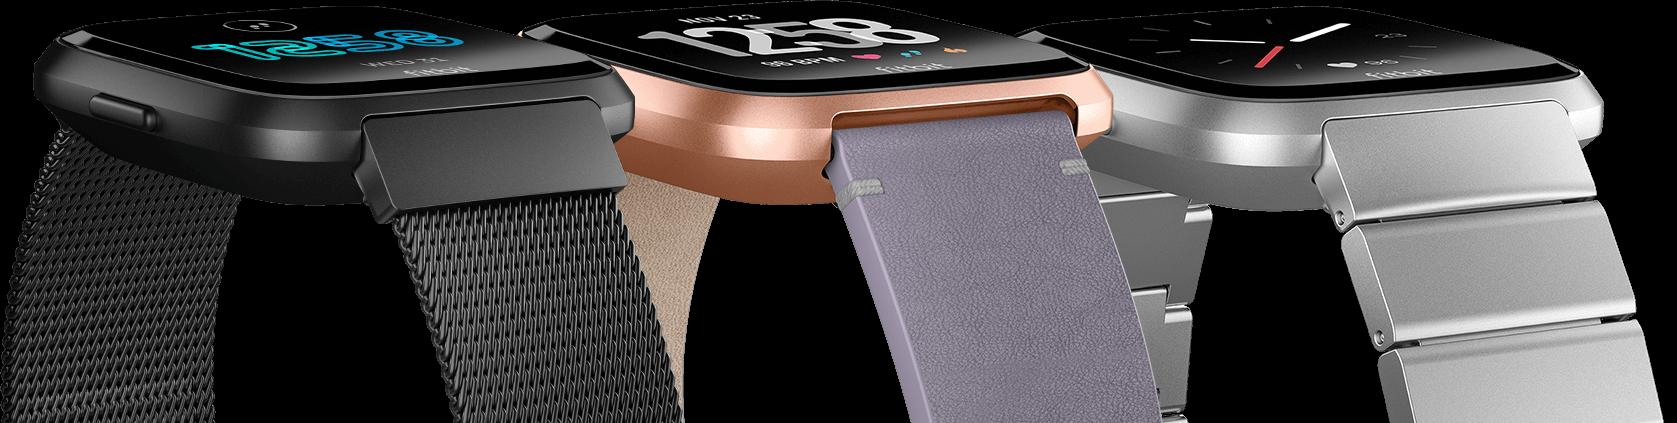 The Fitbit Versa Smartwatch